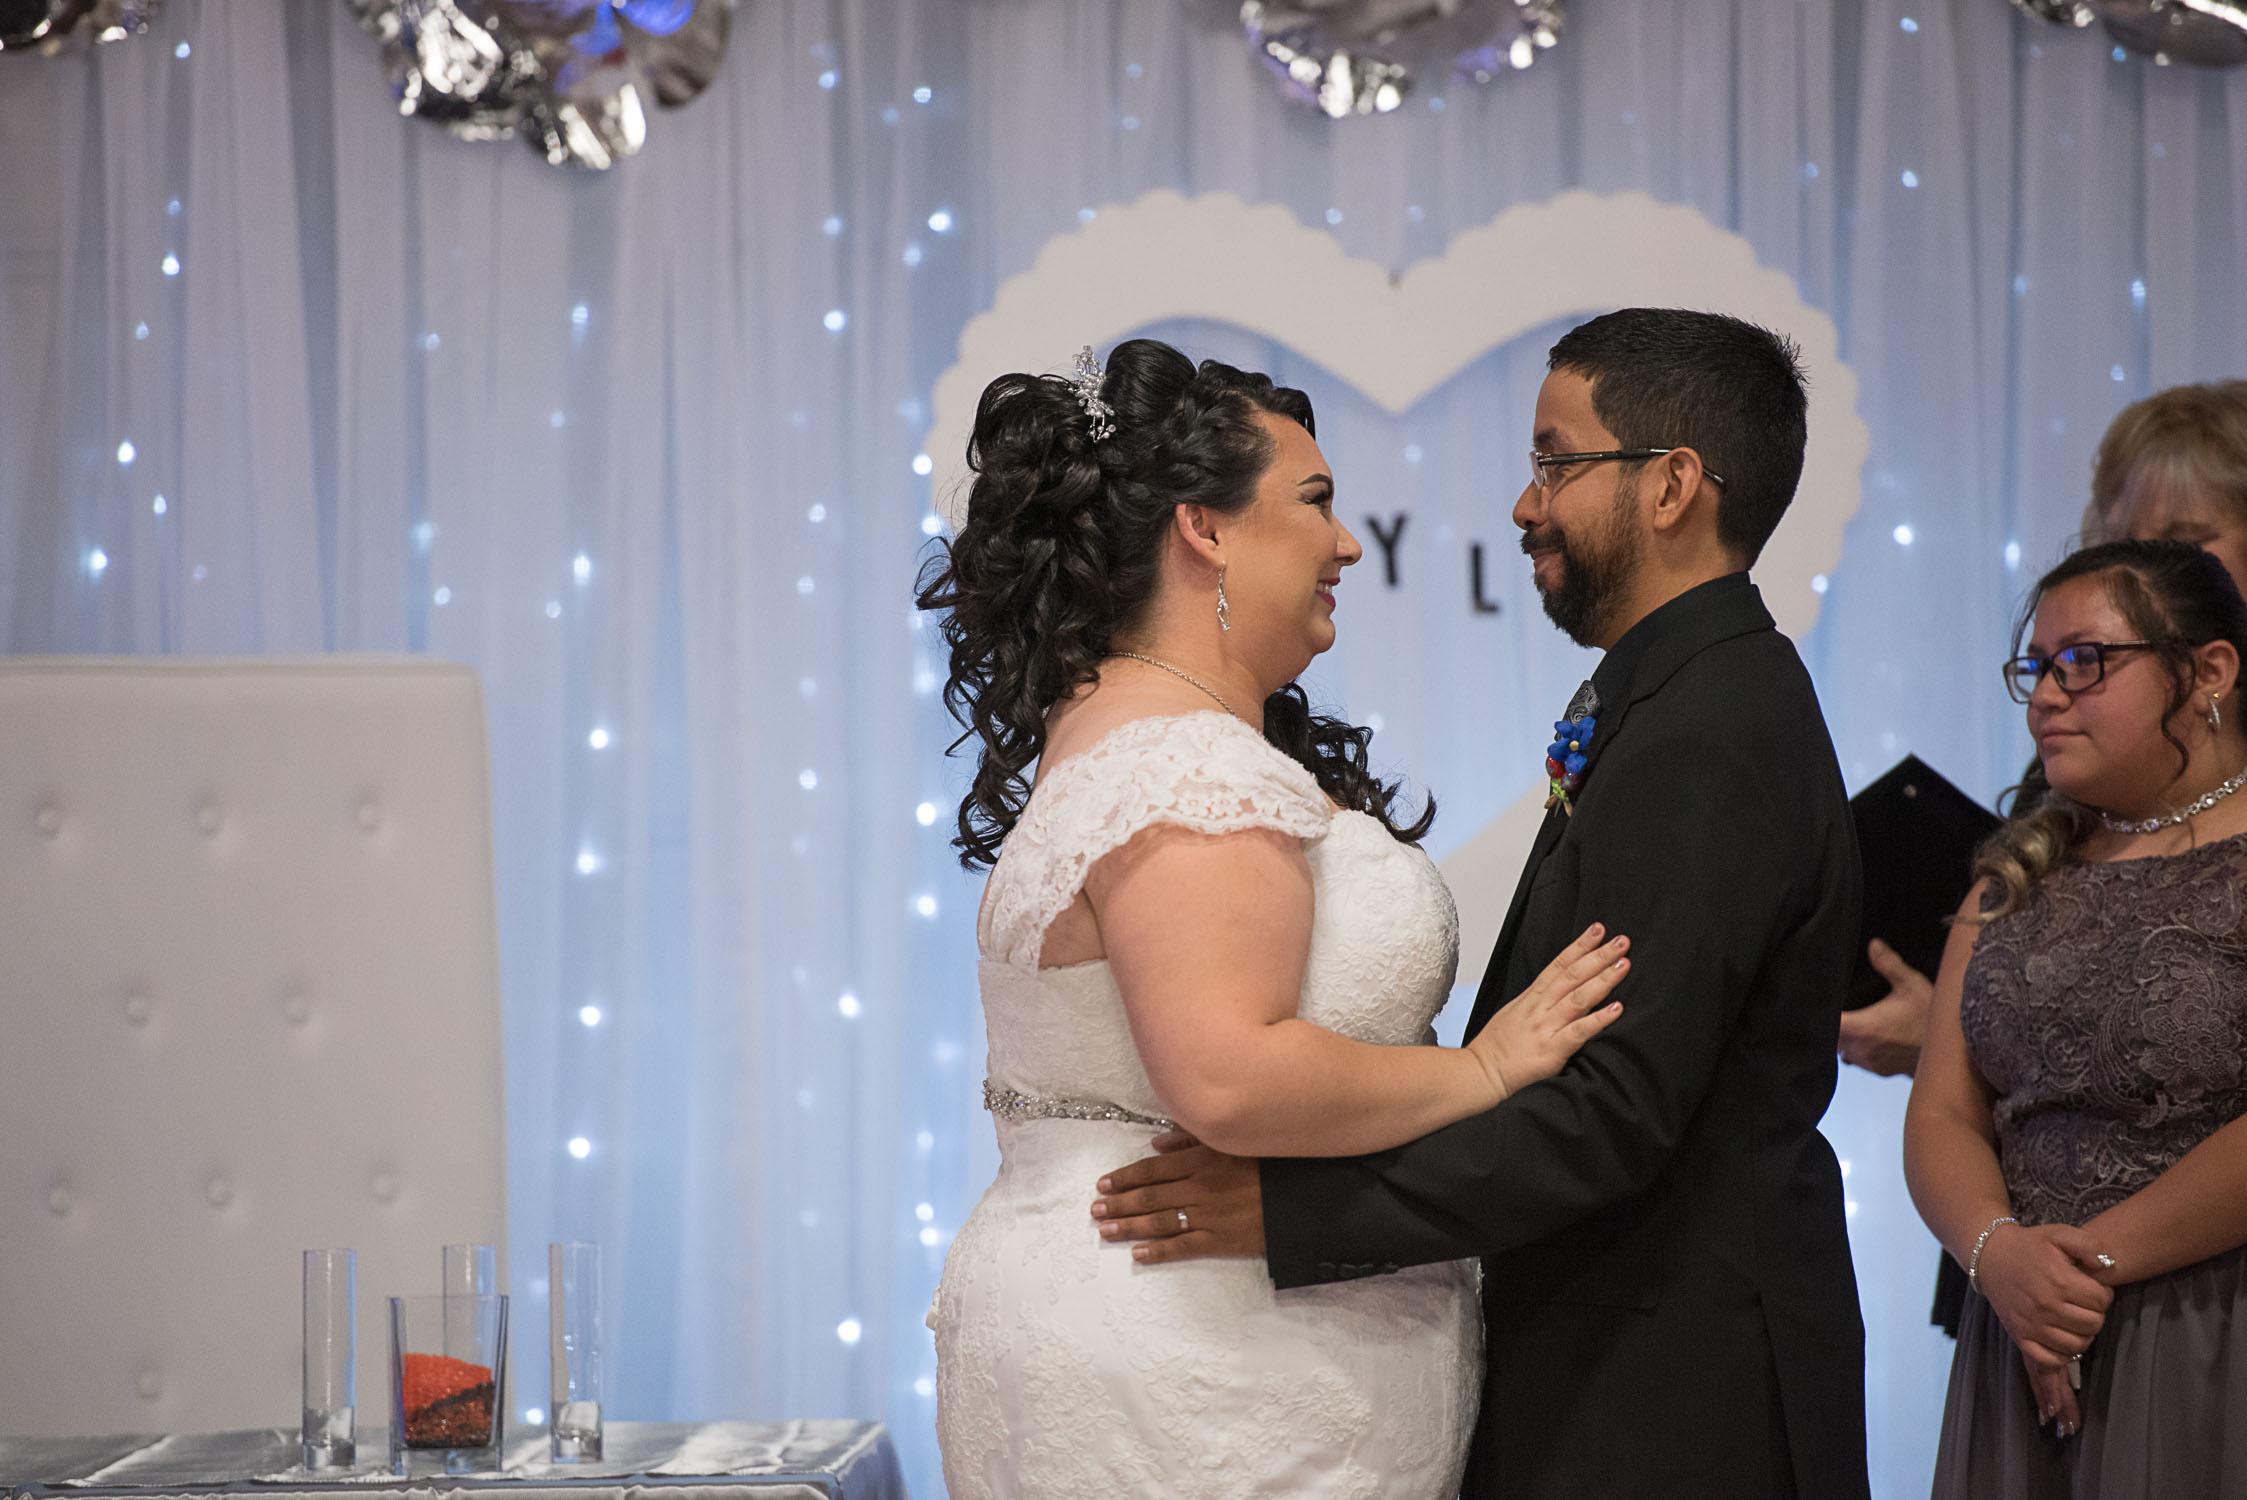 Leal Wedding Mira Visu Photography-123.jpg